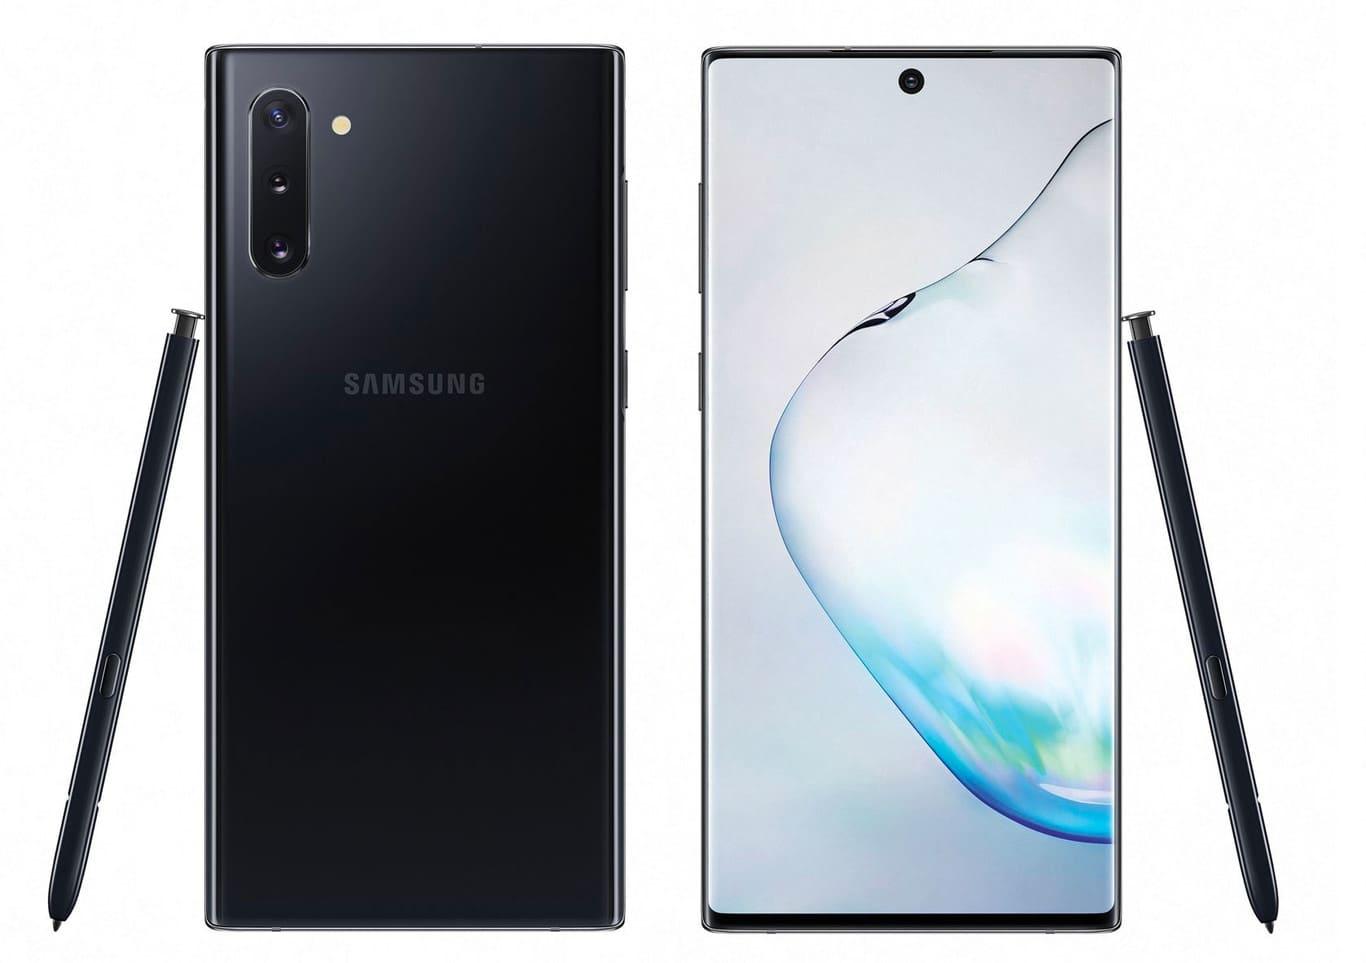 Samsung Galaxy Note 10 modelo Aura Black